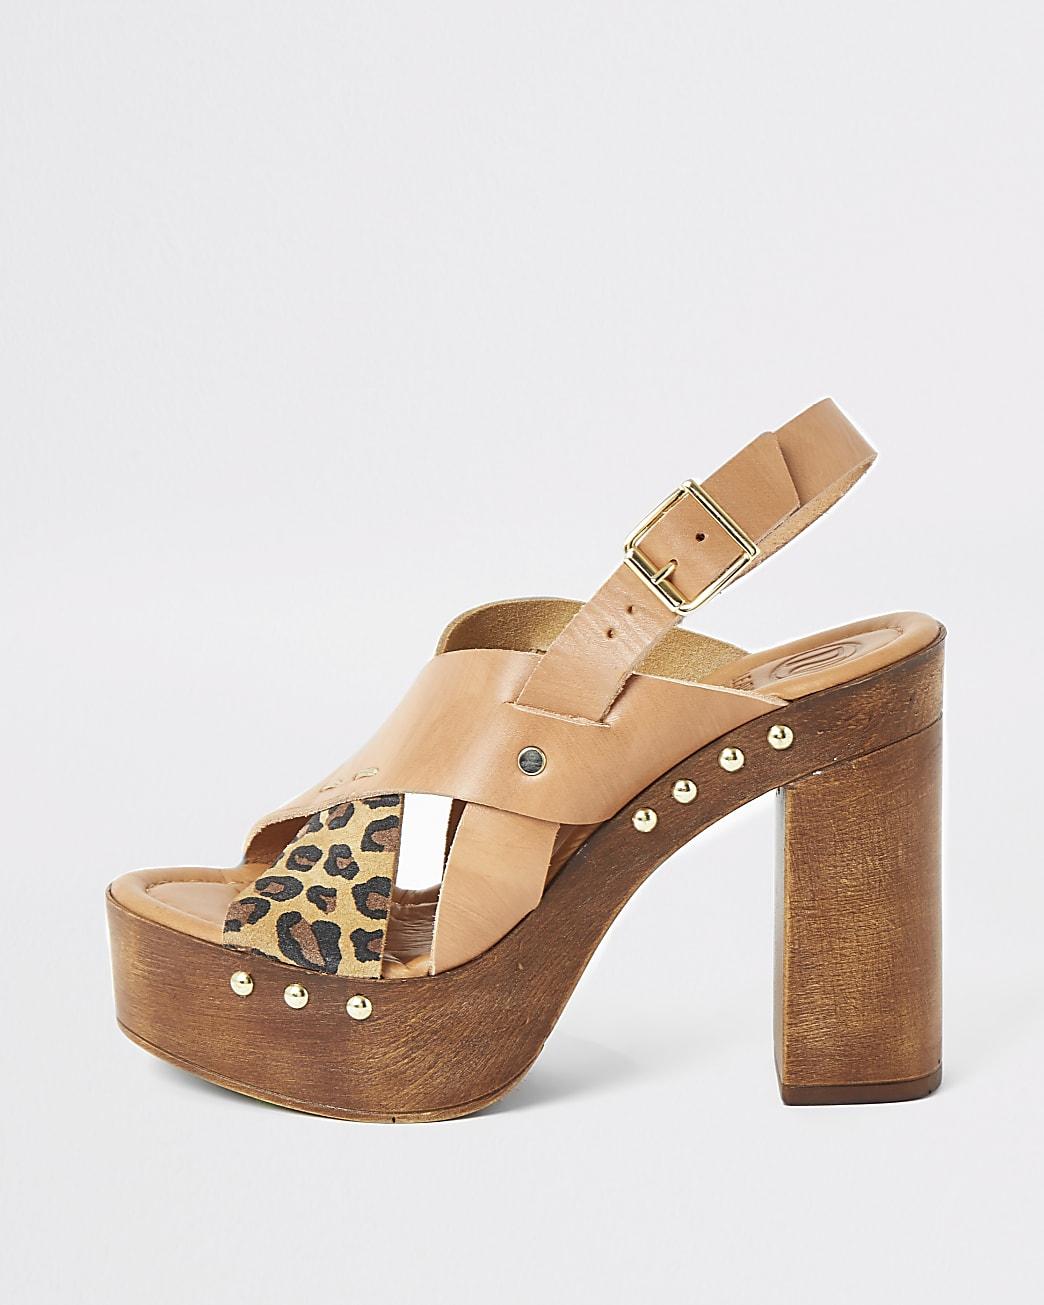 Brown leather cross over platform sandals